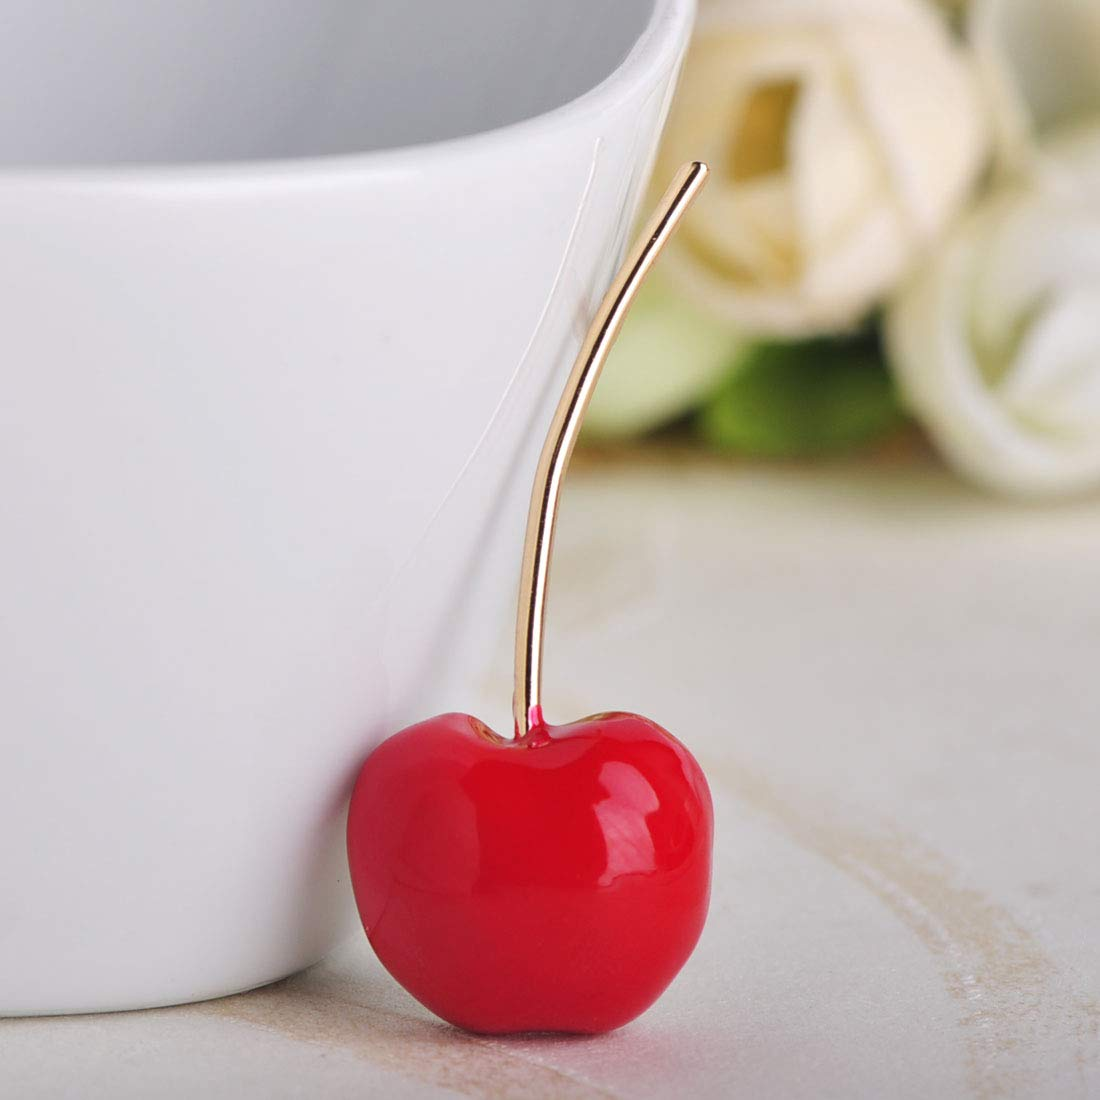 MECHOSE Lovely Red Cherry Shape Brooch Pins for Women Kid Cute Small Enamel Fruit Sweater Shirt Bag by MECHOSEN (Image #5)